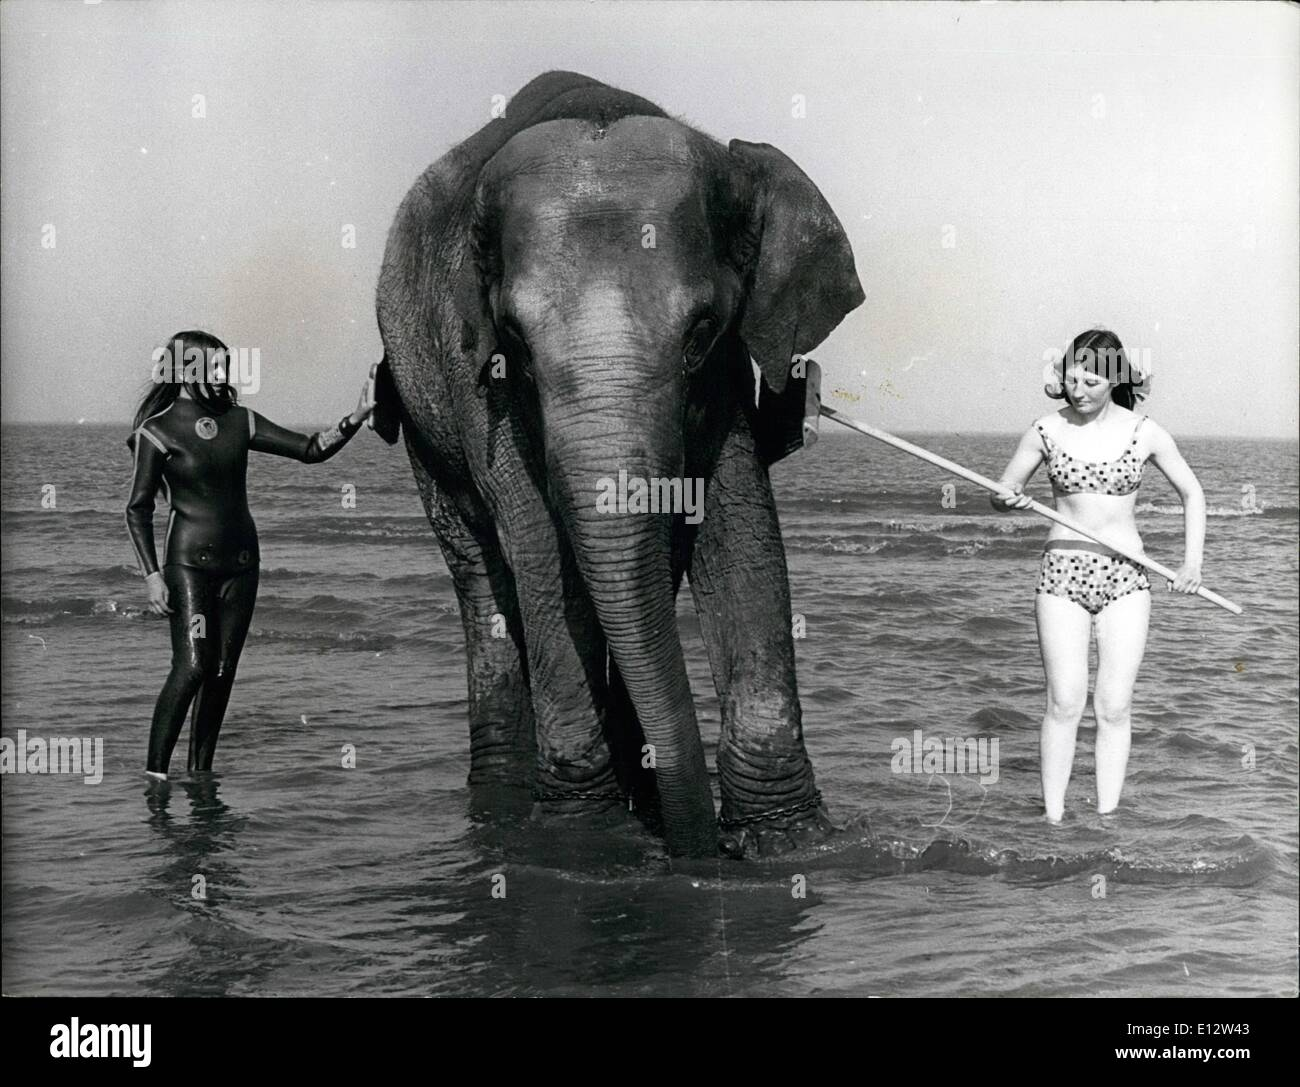 Feb. 25, 2012 - Tanya, the elephant gets her regular weekly scrub down from Linda Burley, 16 (left) and Denise Hunwicks. - Stock Image